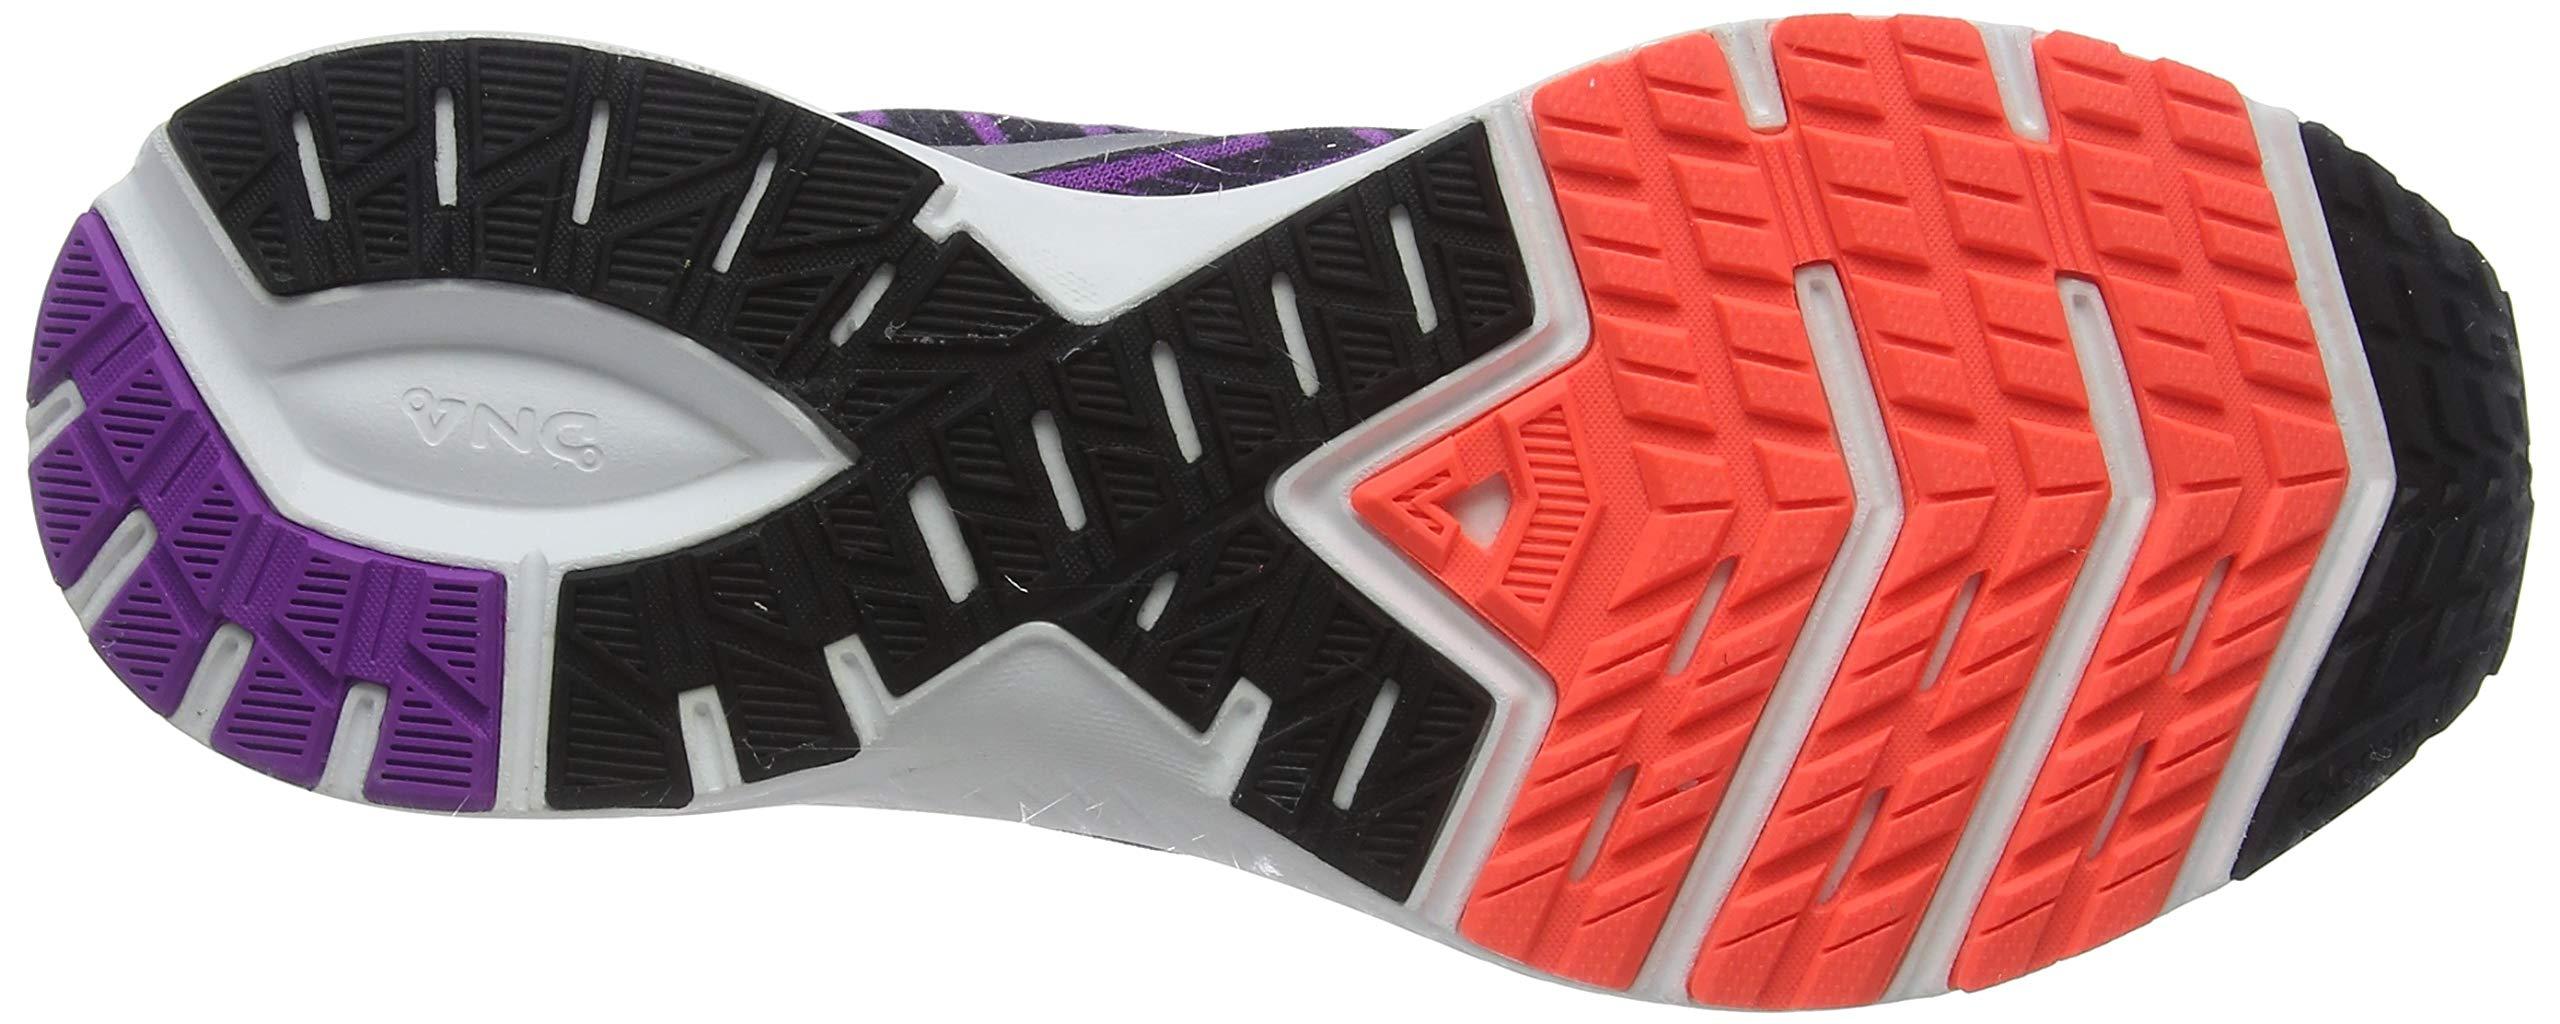 71Y 8cjq9OL - Brooks Women's Launch 6 Running Shoes